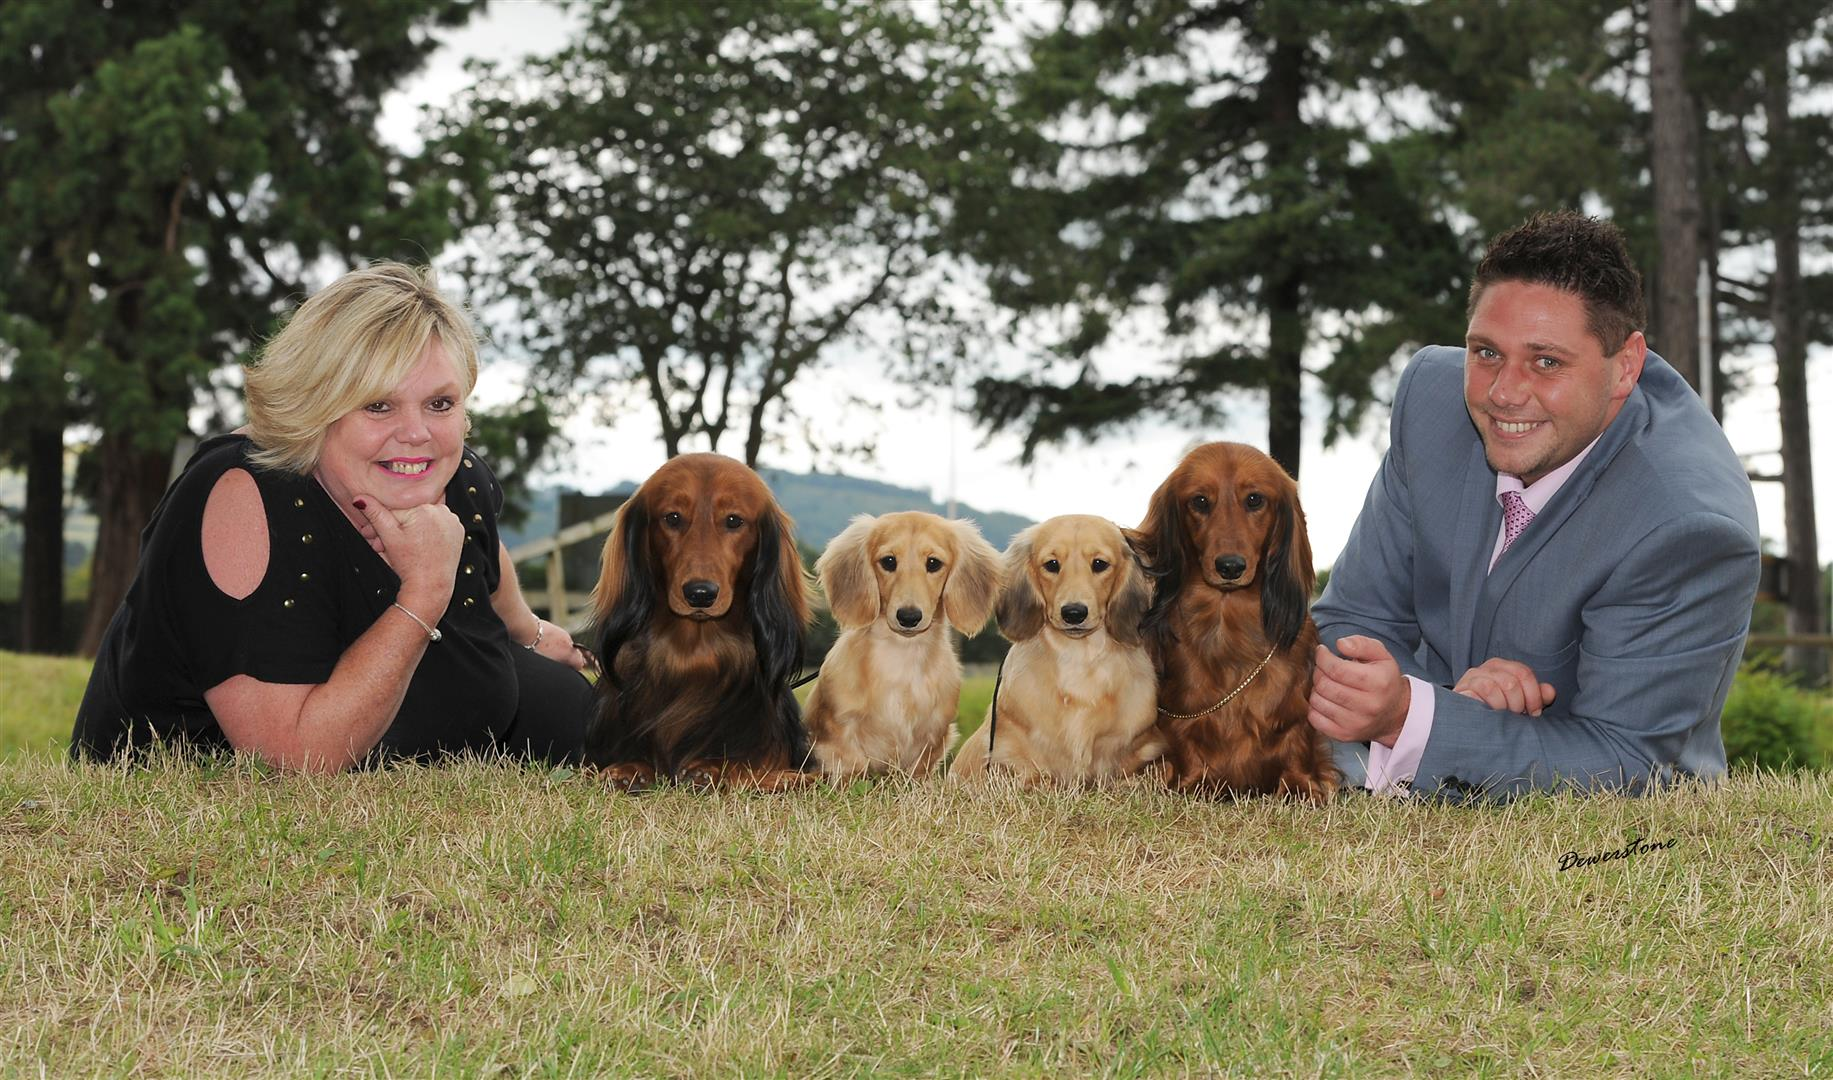 Zarcrest – UK Top Dachshund Hobby Breeders & Show Kennel. - photo#18